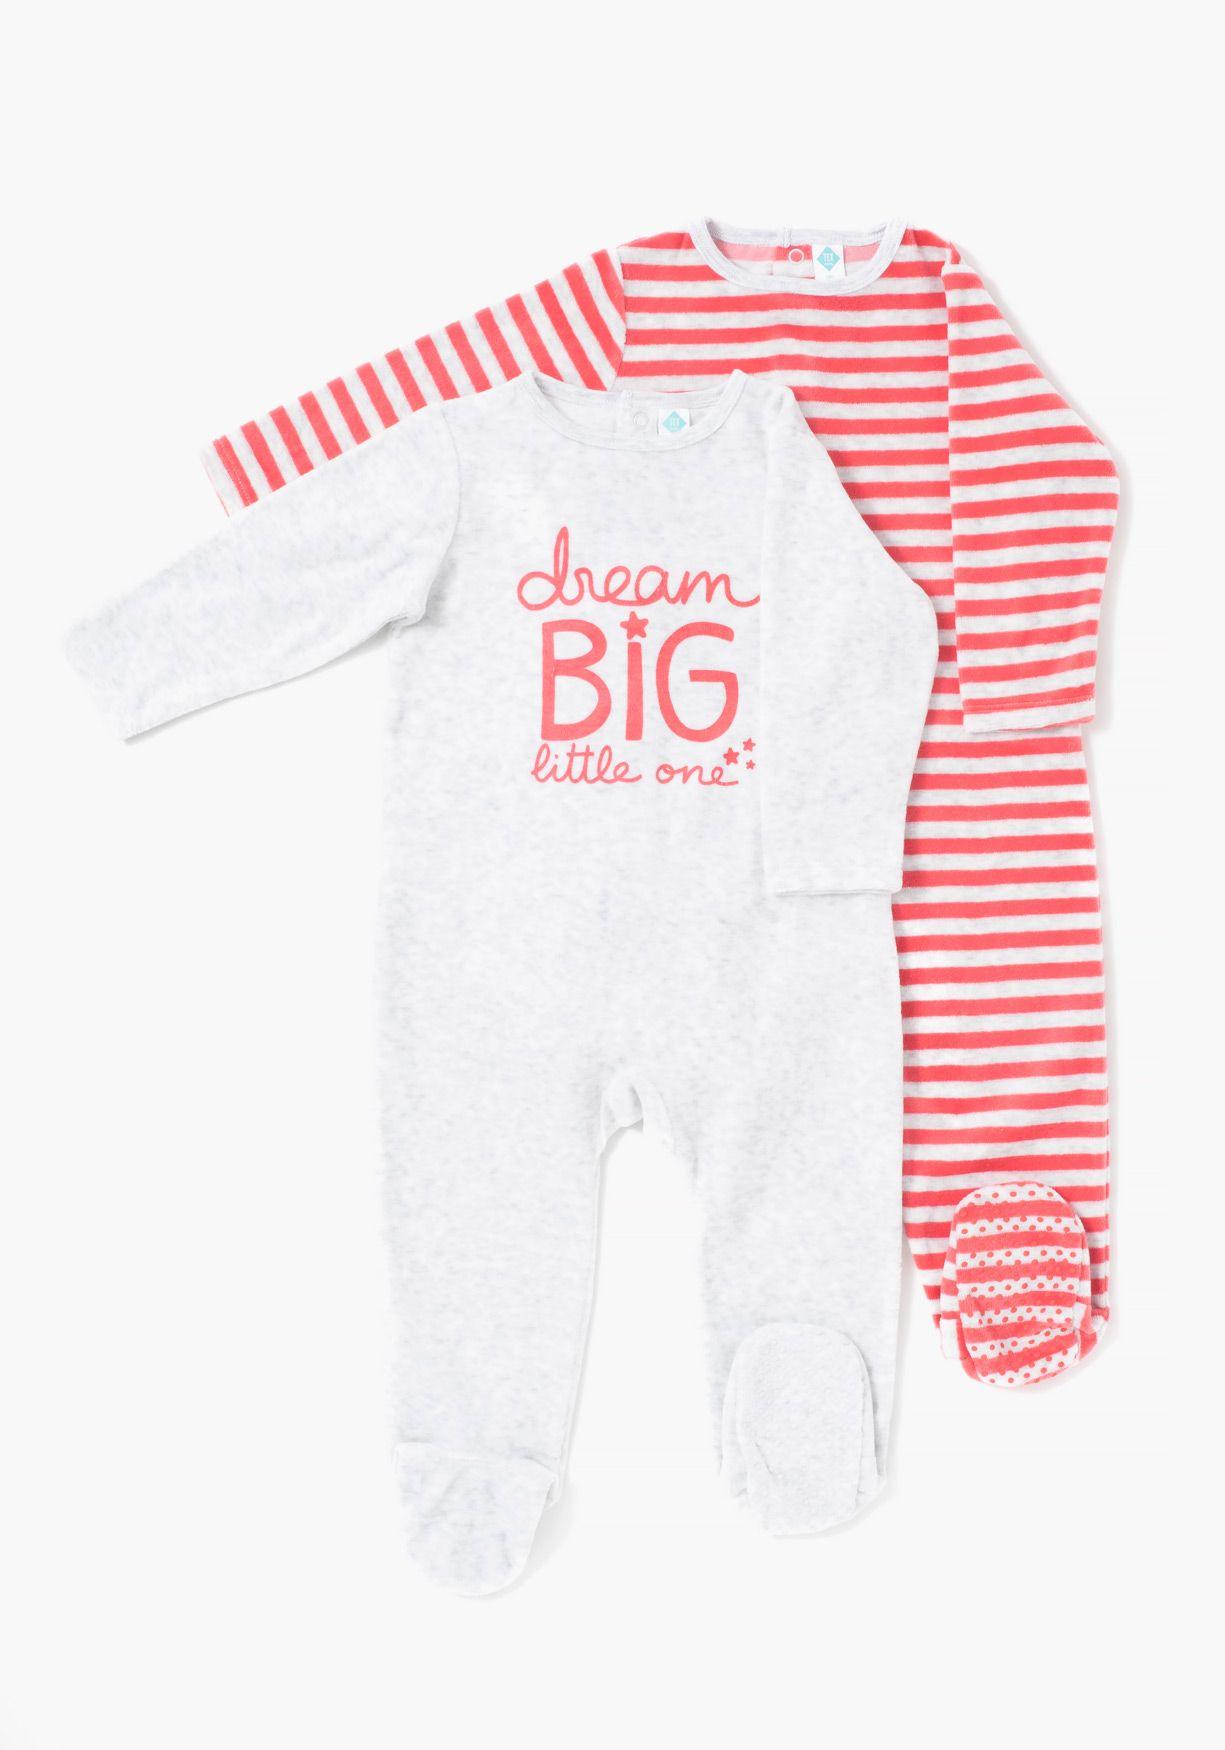 c024a098d Pack de dos pijamas aterciopelados de niño o niña de manga larga